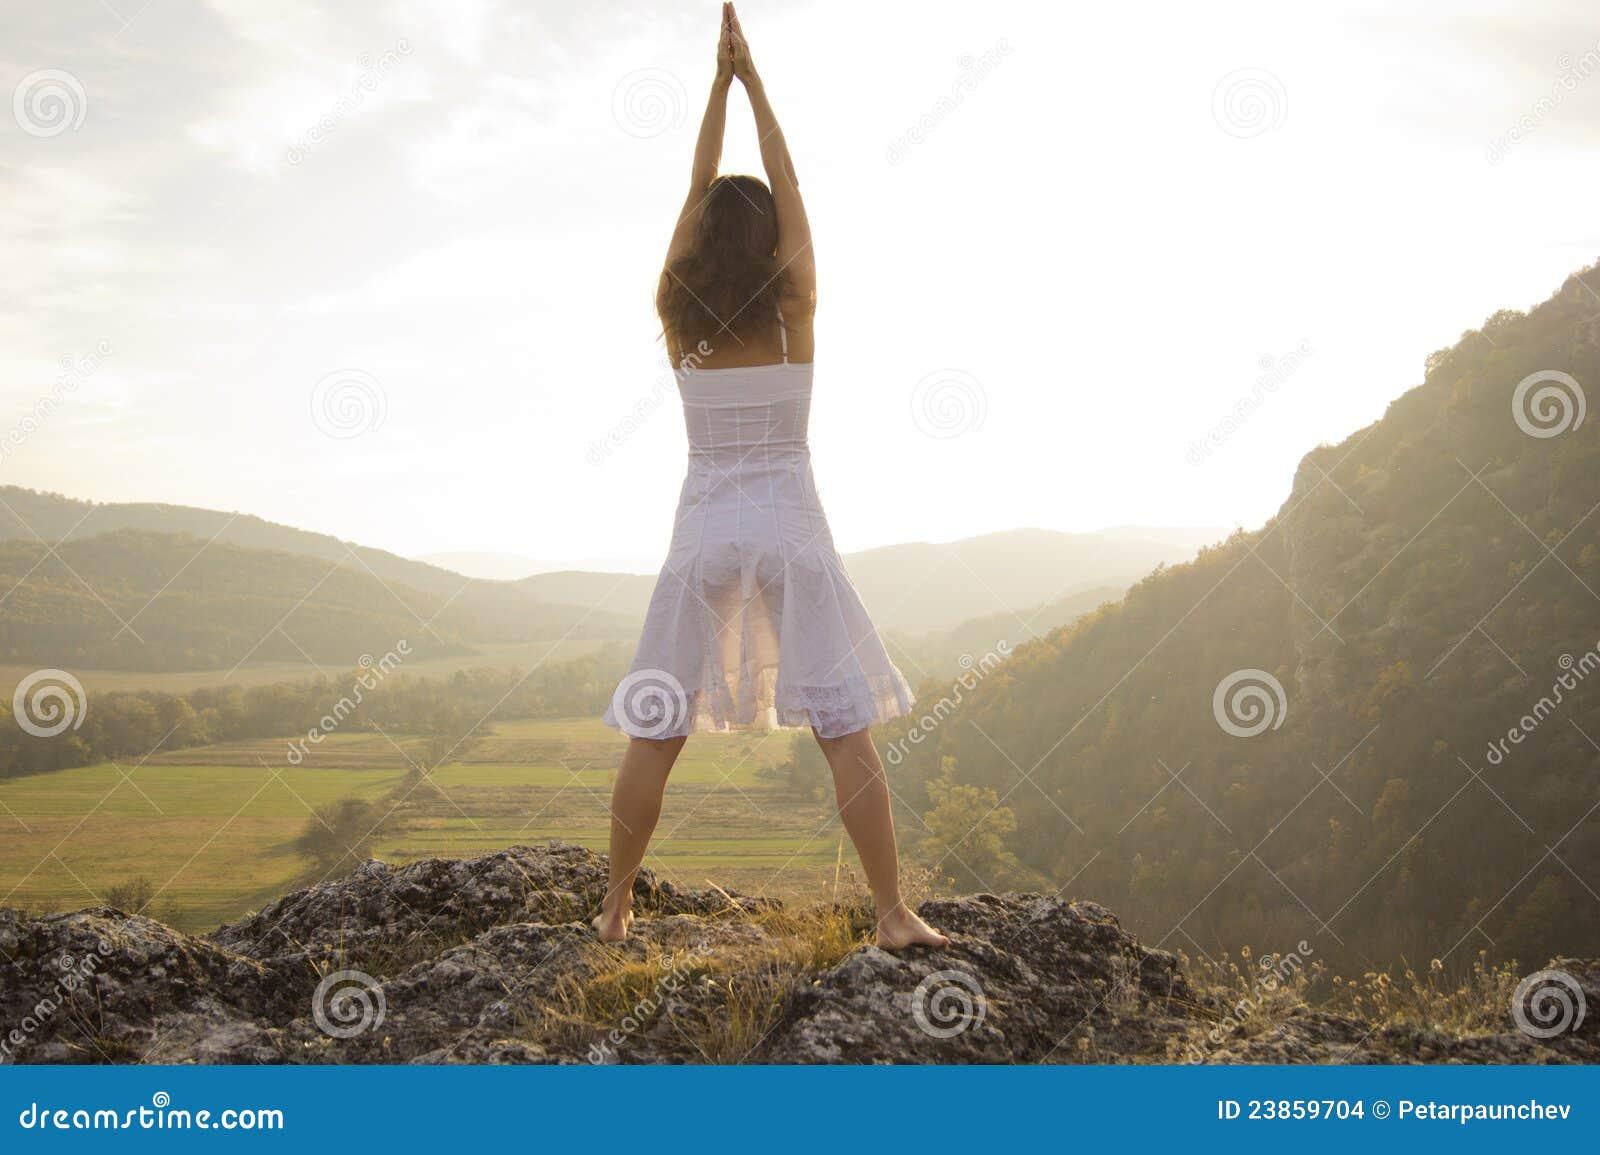 Levantando os braços para cumprimentar o sol